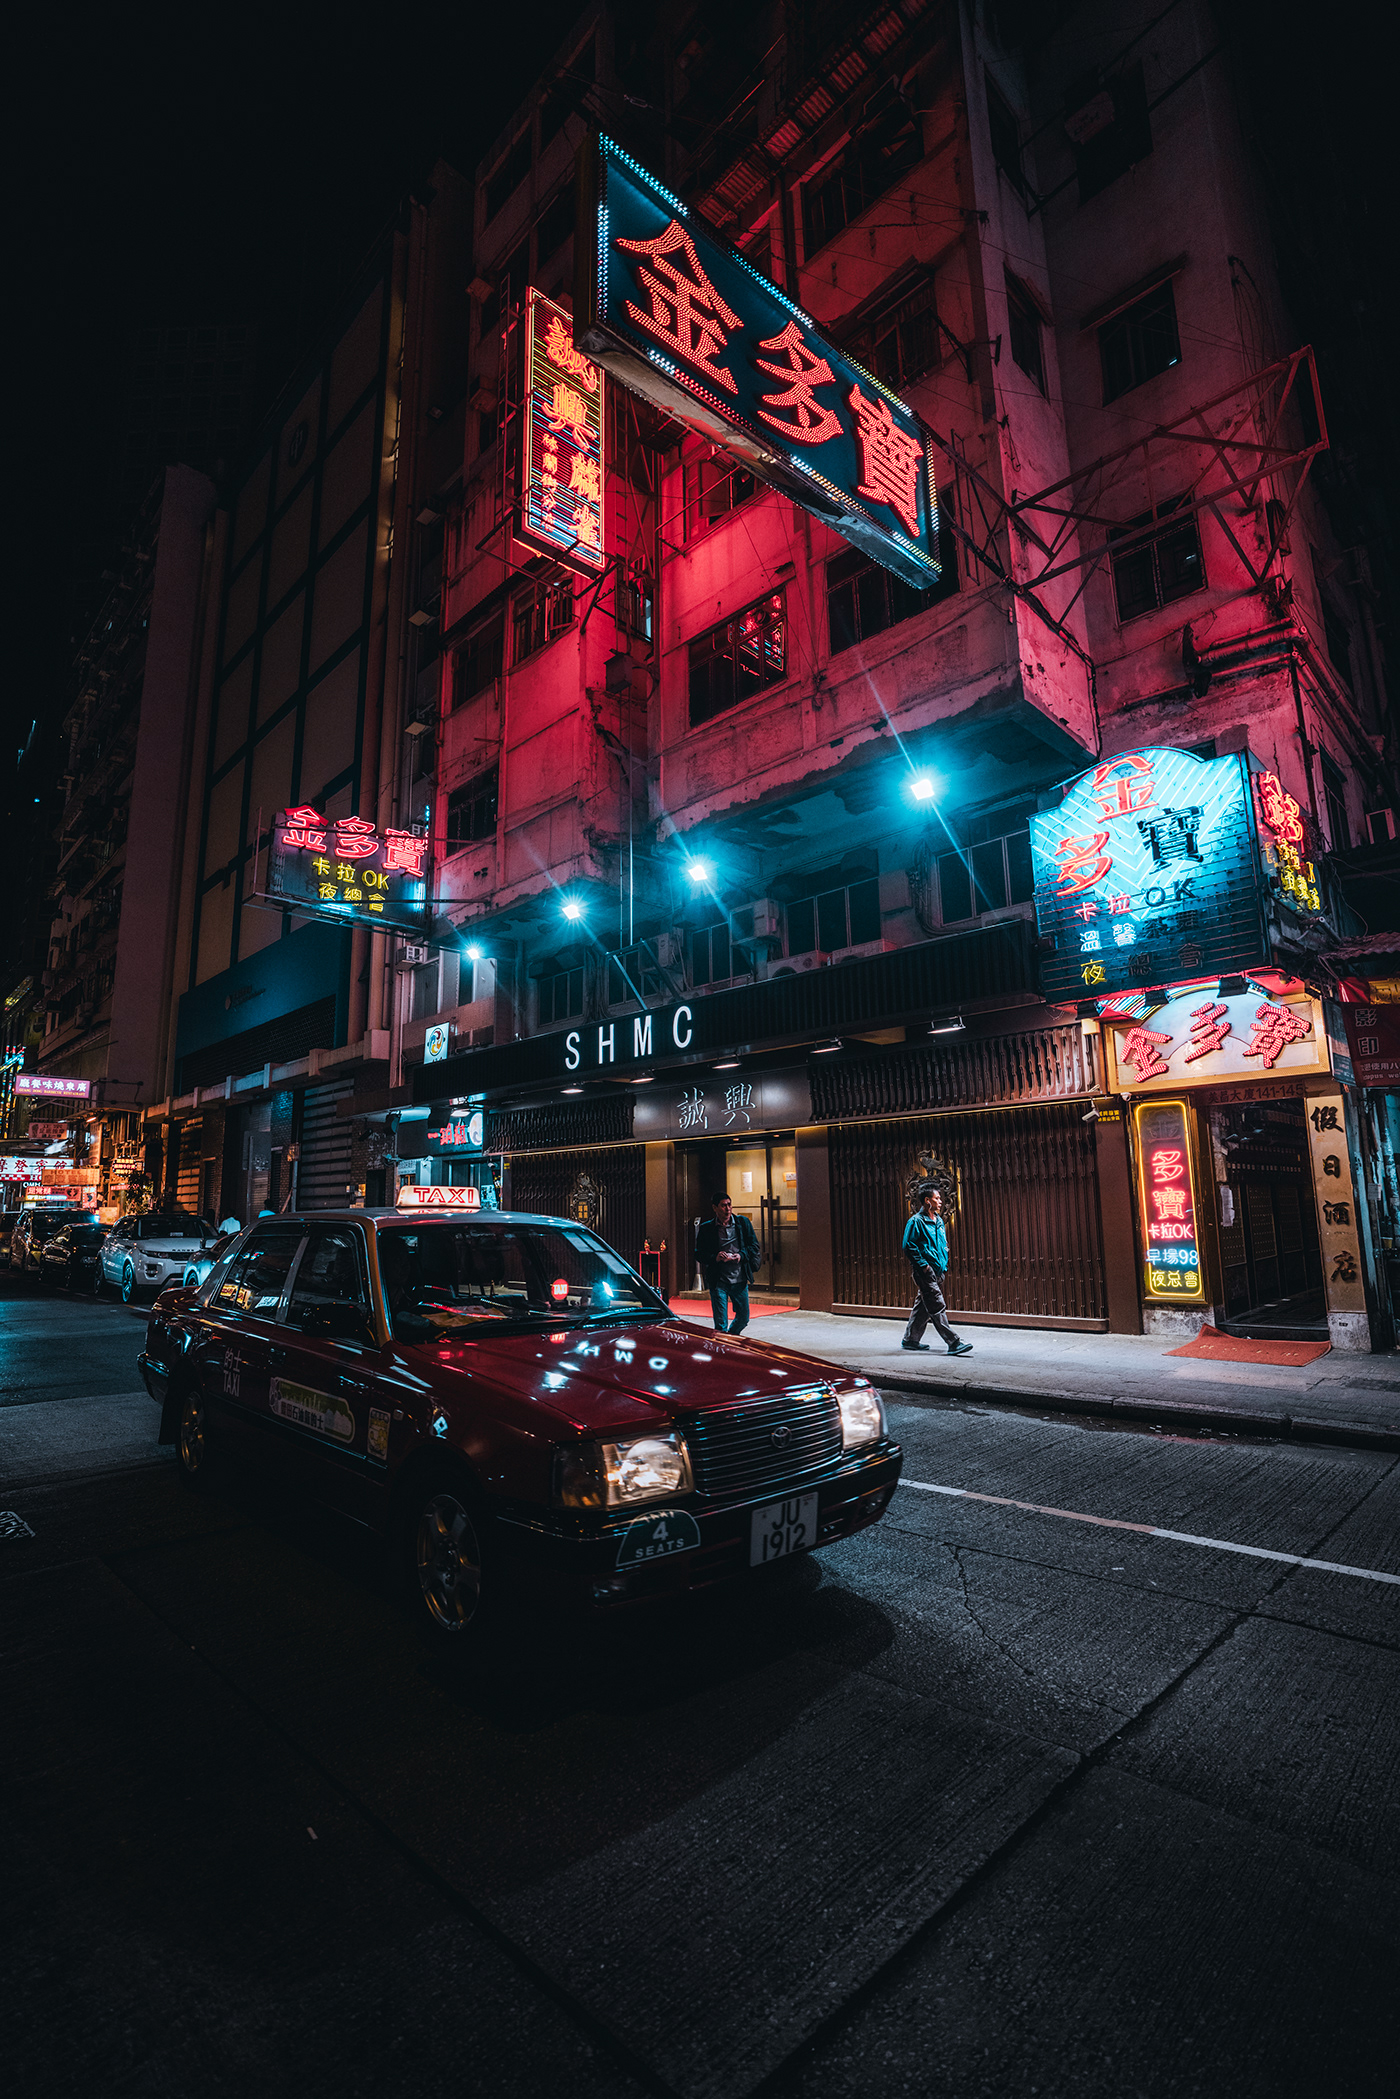 Hong Kong night photography neon urban photography street photography Night Cityscapes City Exploration colors skyscrapers asia